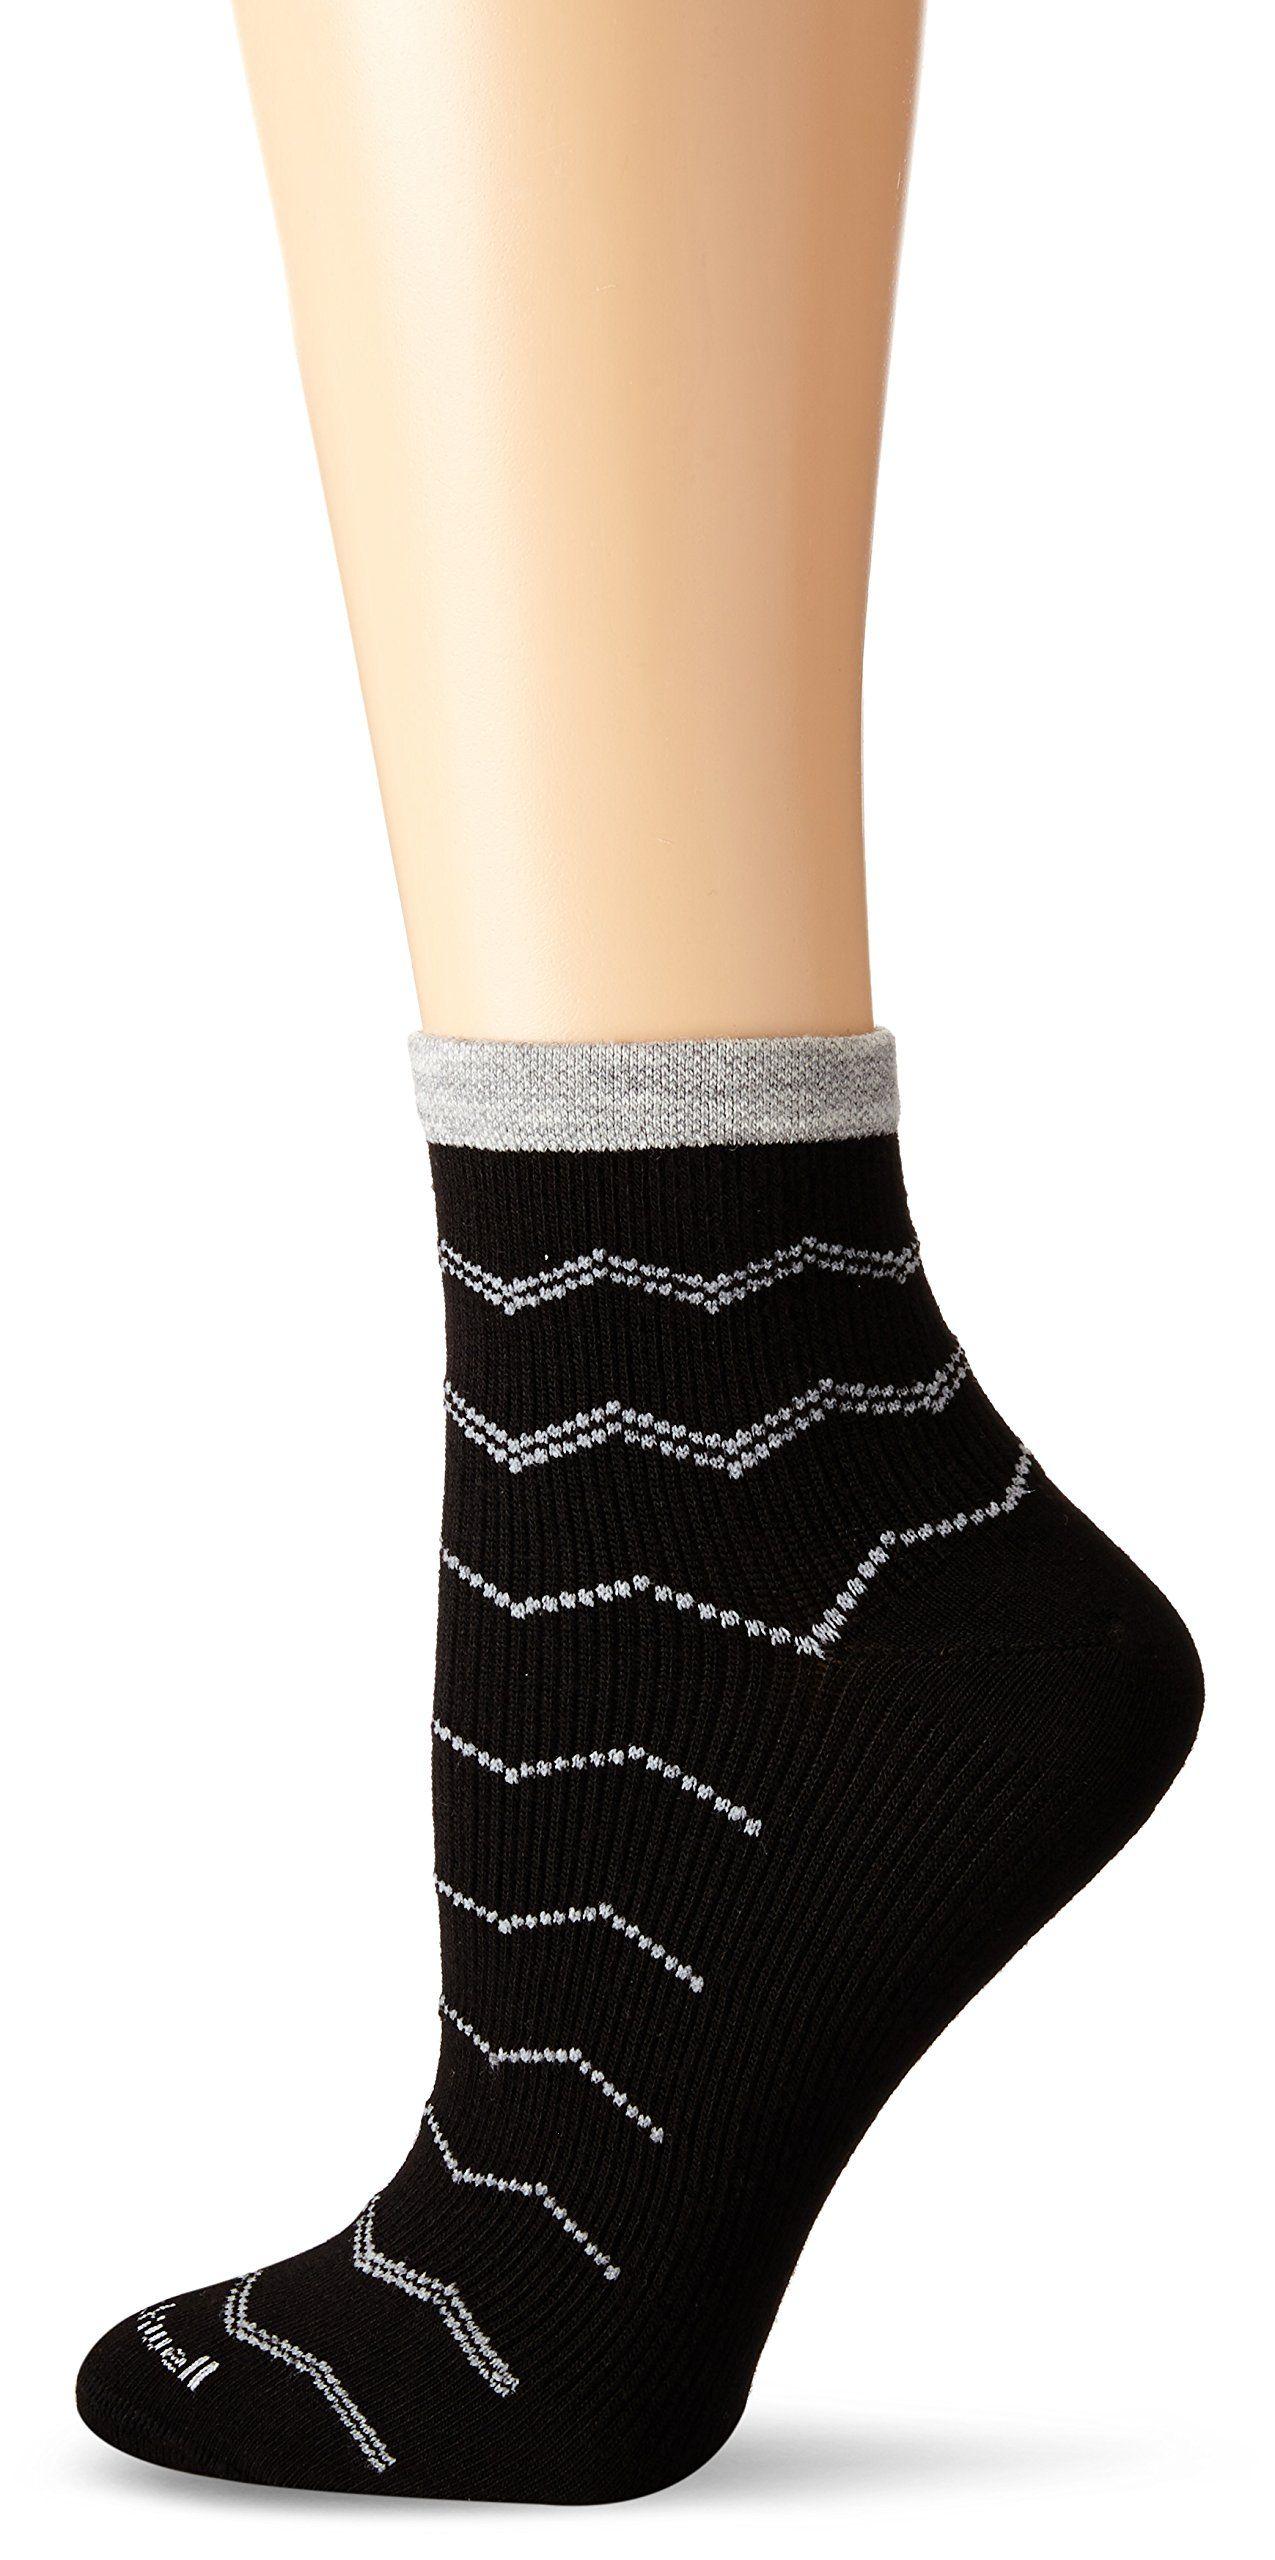 f0cf1e9de8 Sockwell Women's Plantar Ease Firm Compression Socks, Black, Medium/Large.  Super fine